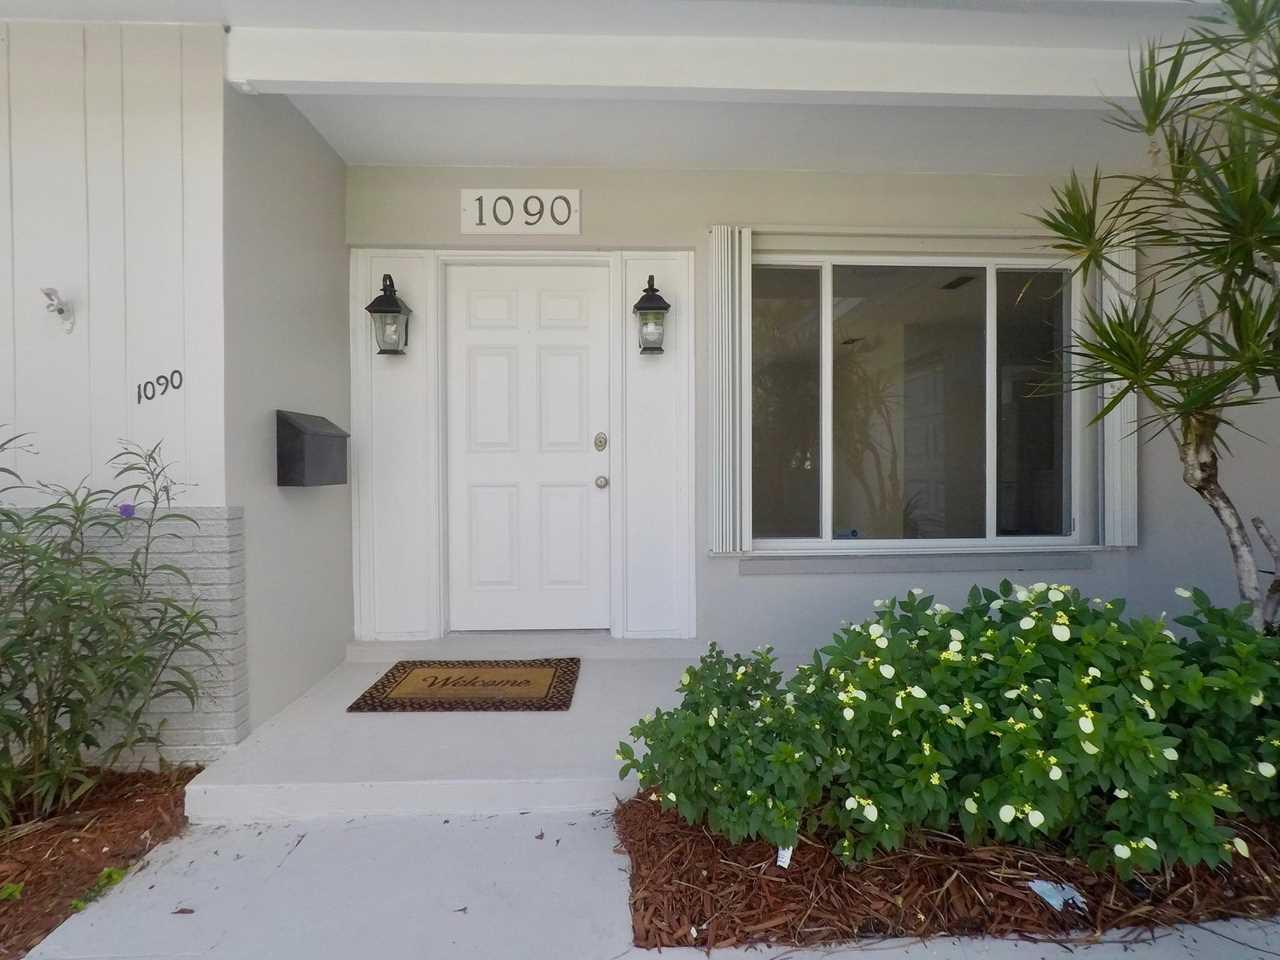 1090 SW 13Th Street Boca Raton, FL 33486 - MLS# RX-10460008   BocaRatonRealEstate.com Photo 1